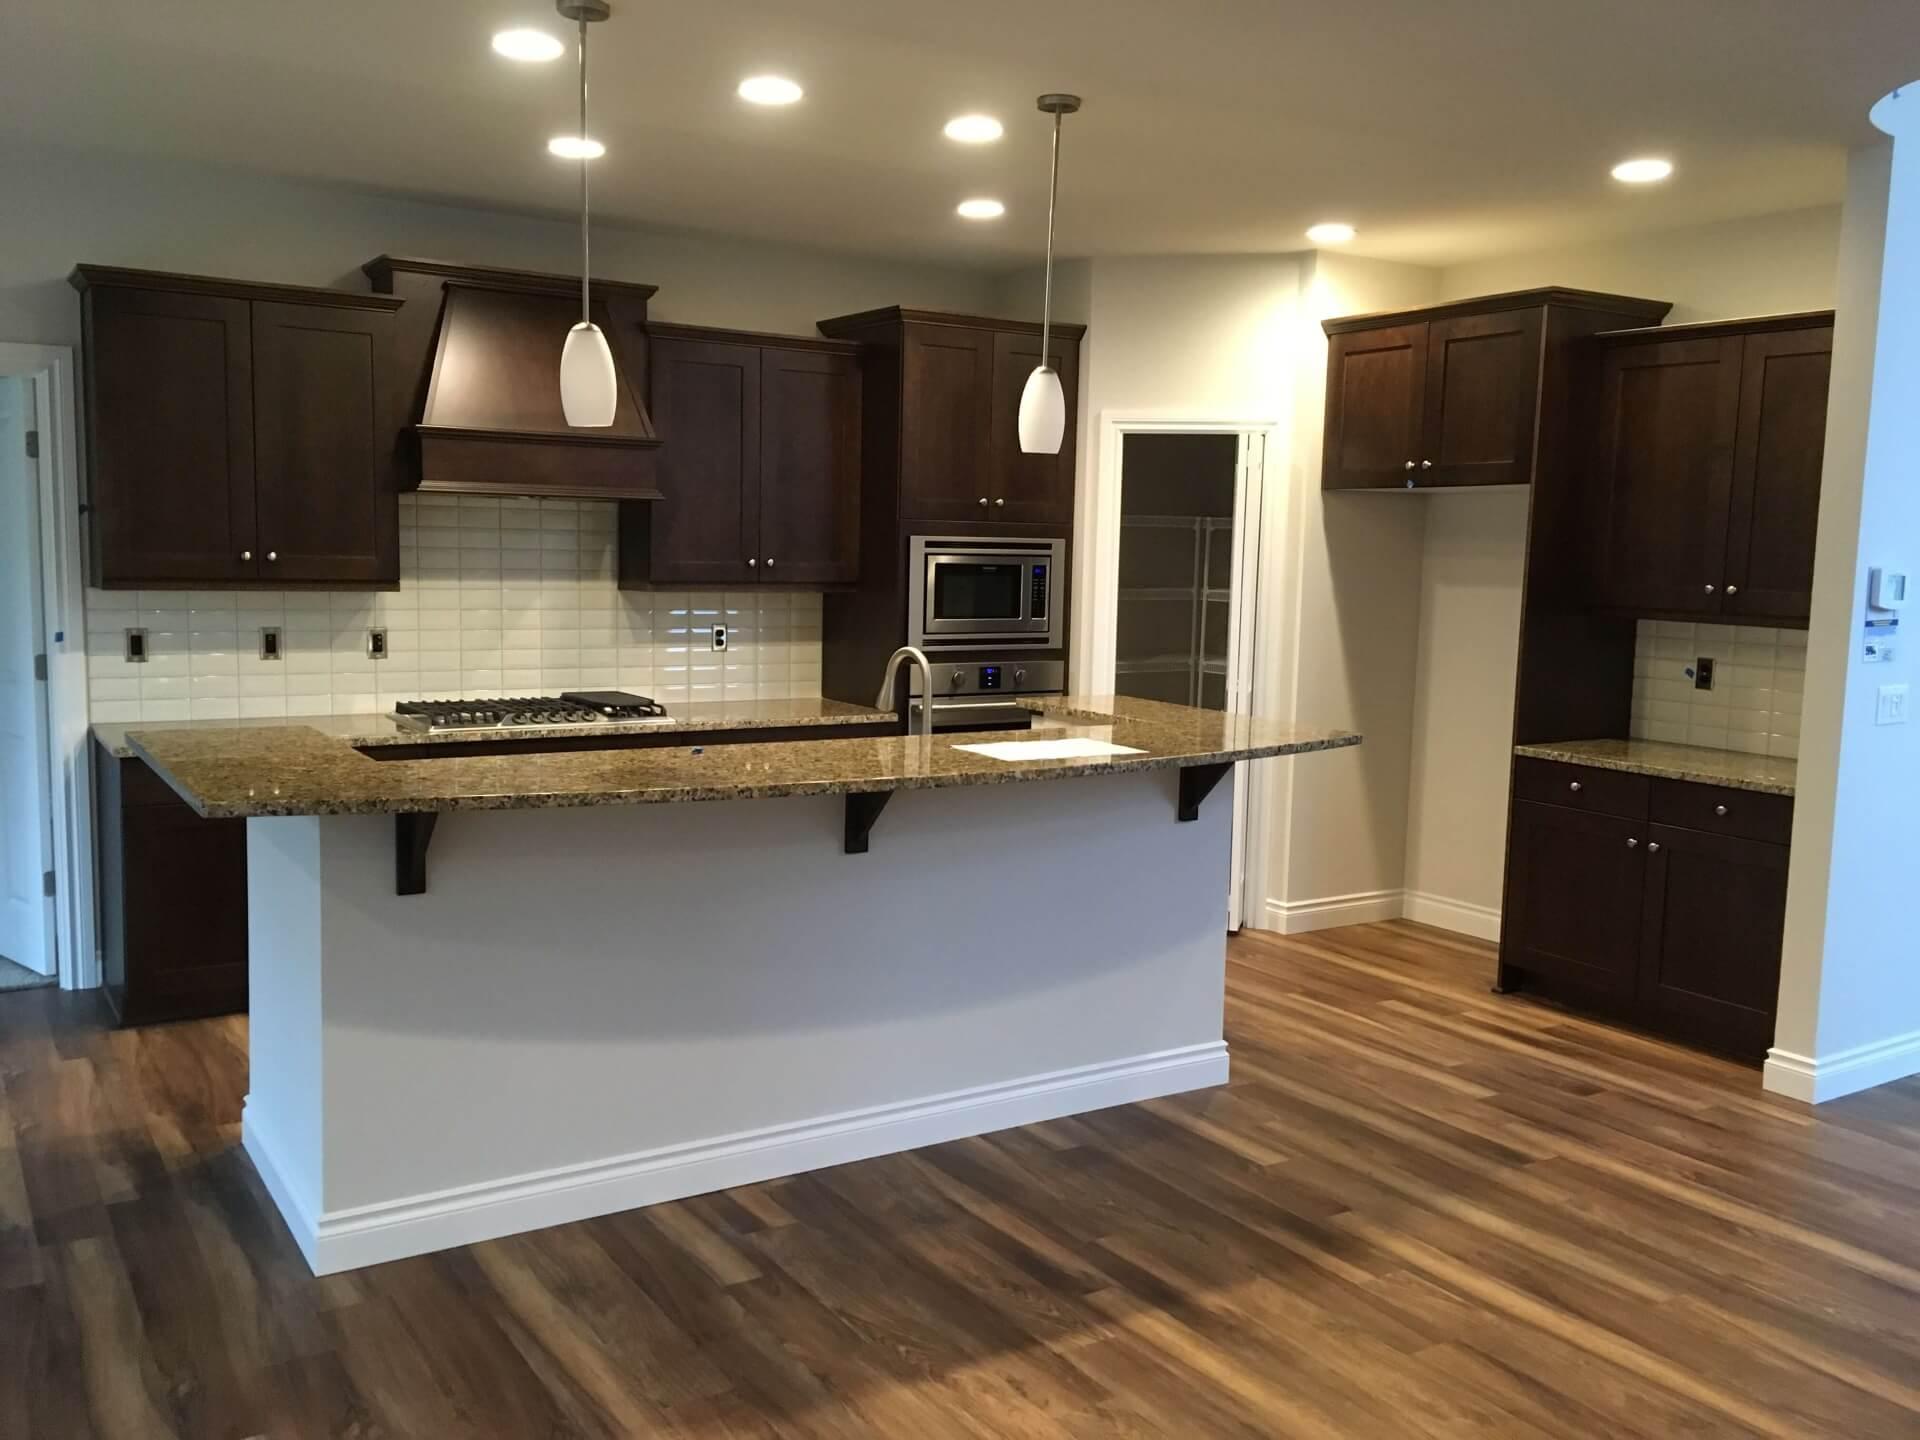 Professional kitchen remodel in Bellevue